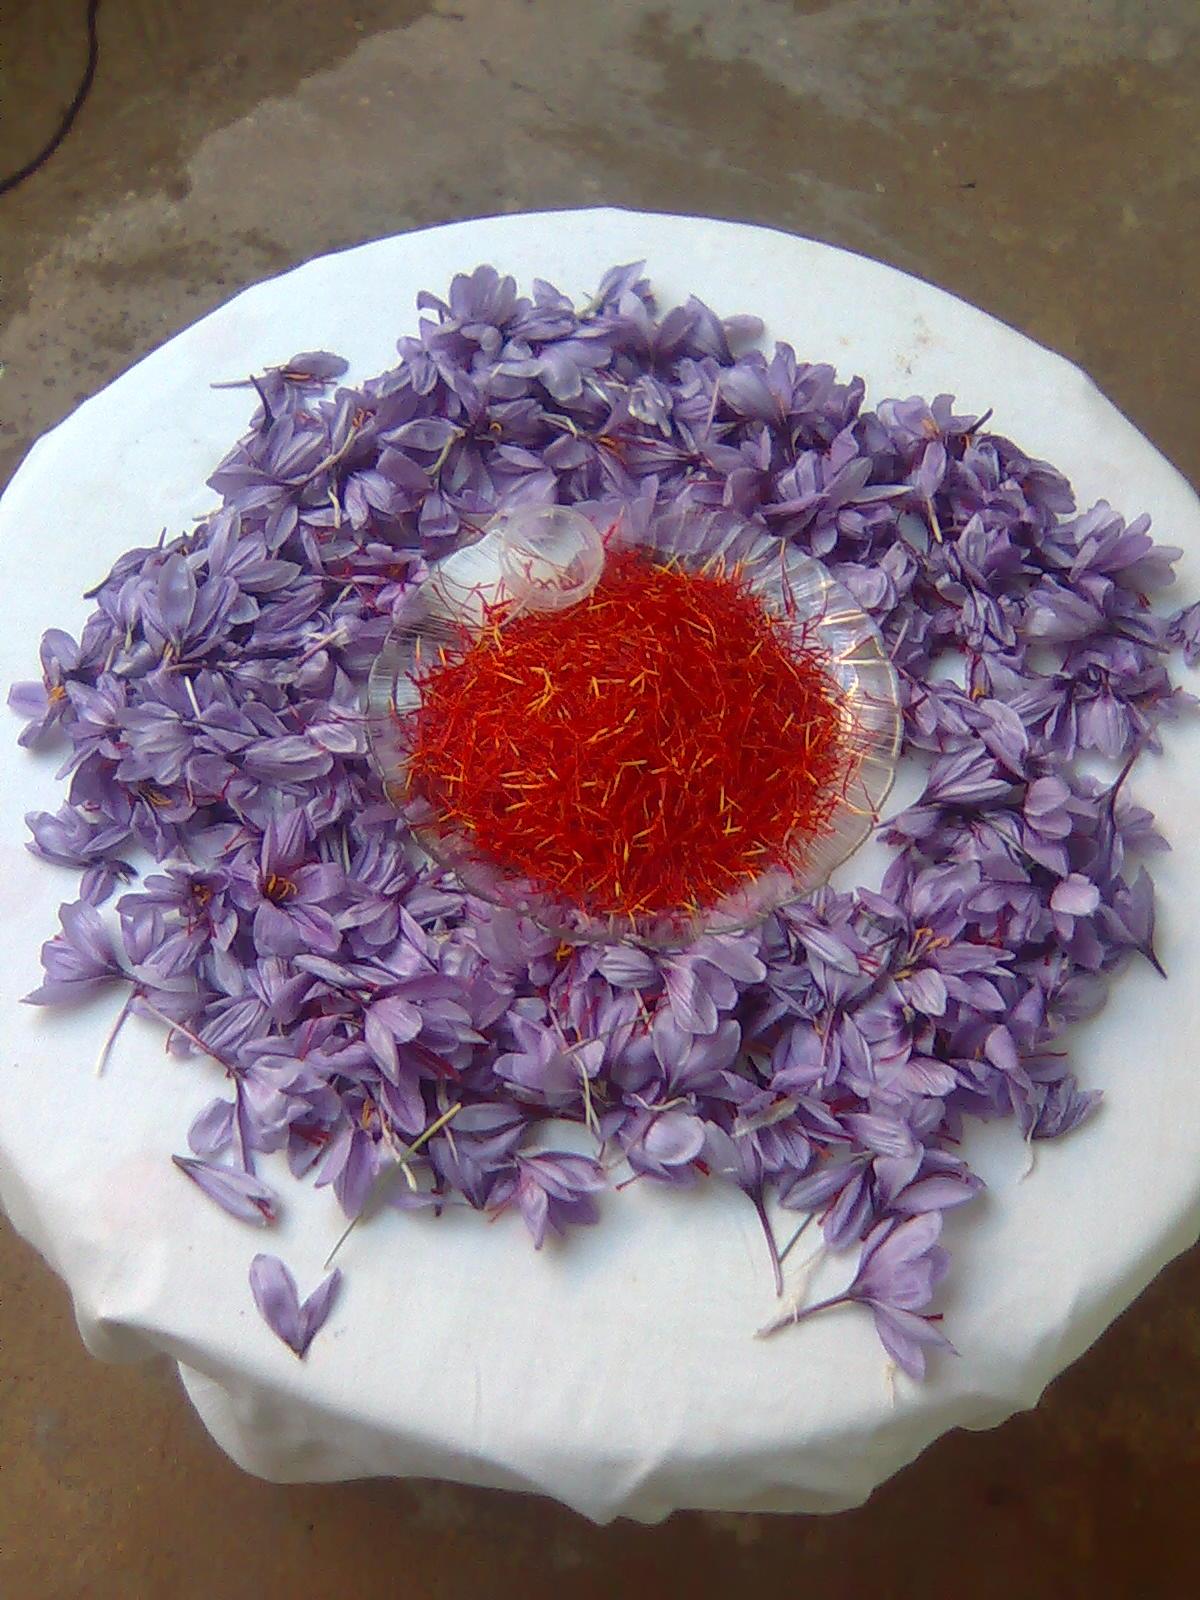 Safran en fleur et en pistils